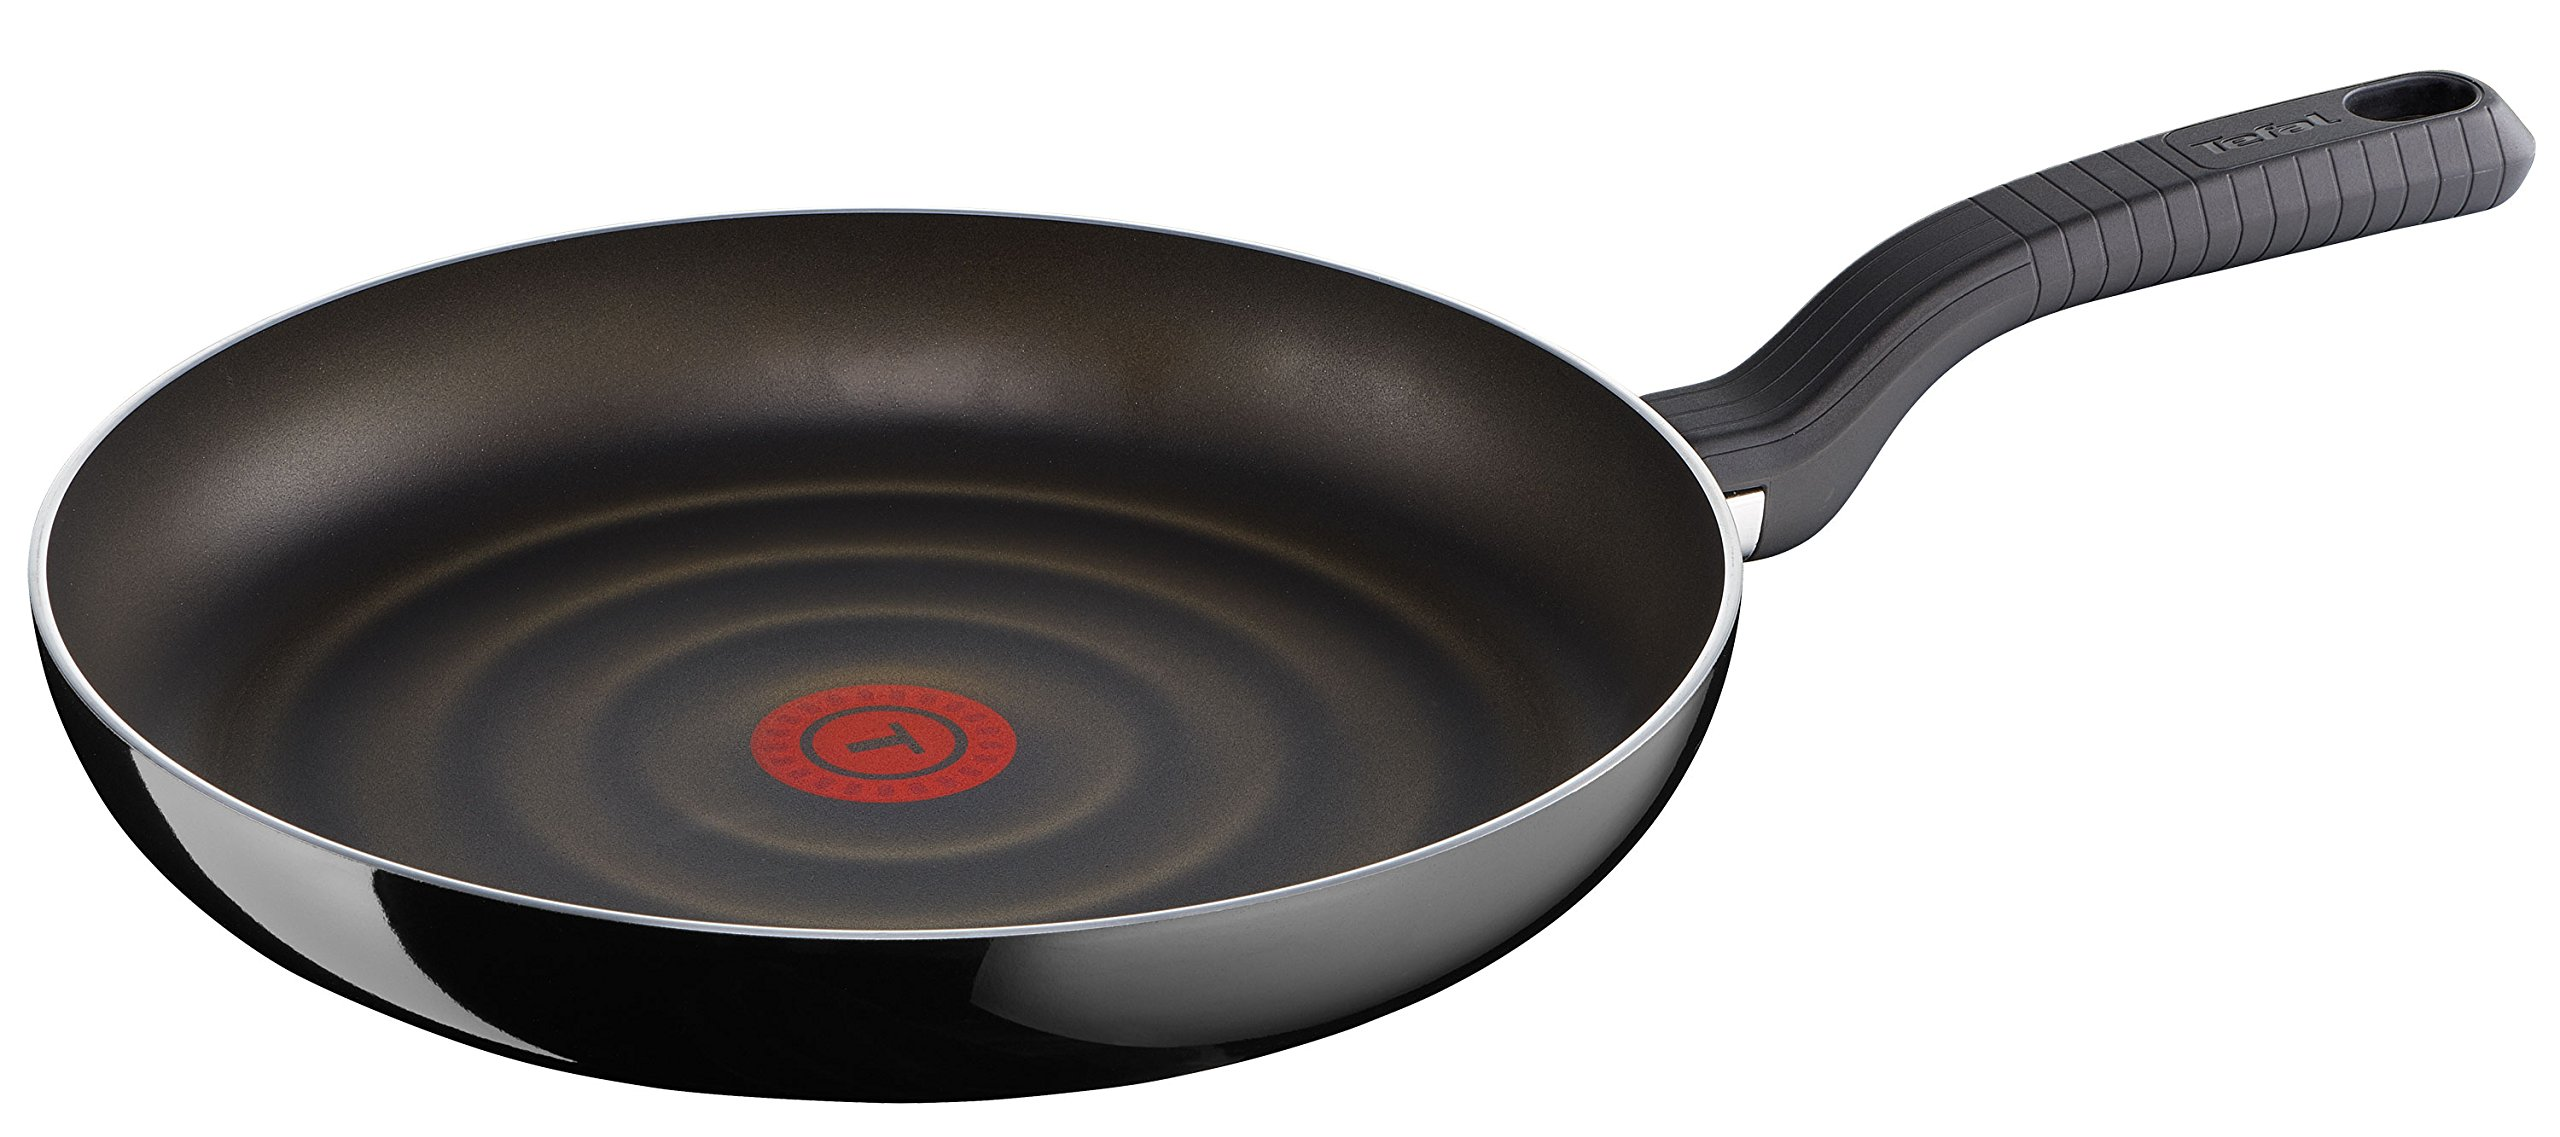 Tefal D50302 All-purpose pan Round frying pan - frying pans (All-purpose pan, Round, Black, Titaniu